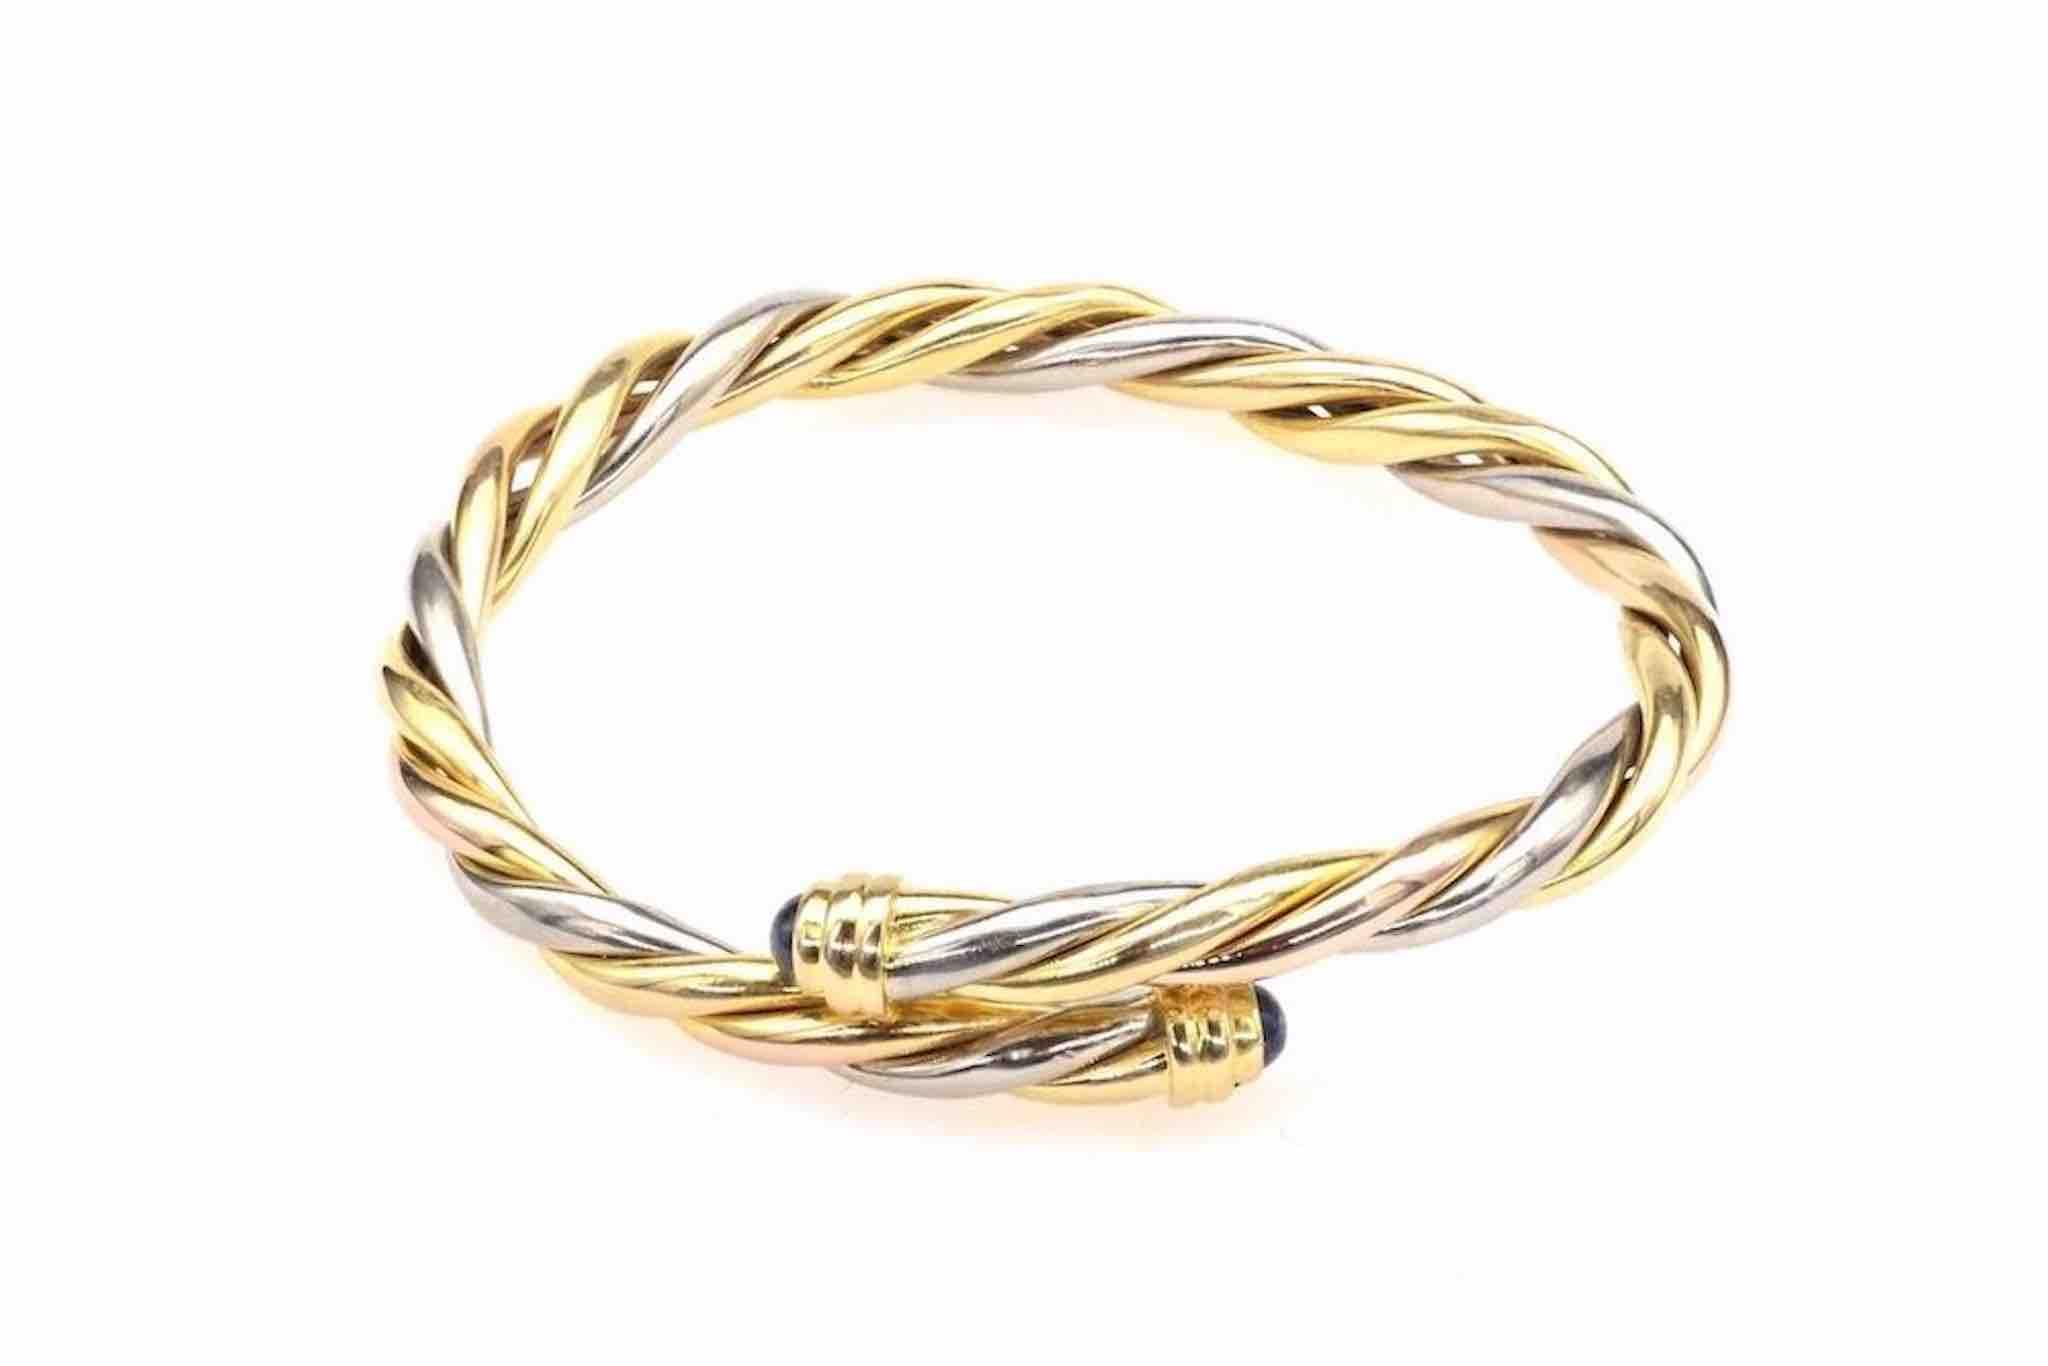 rachat Bracelet Cartier jonc